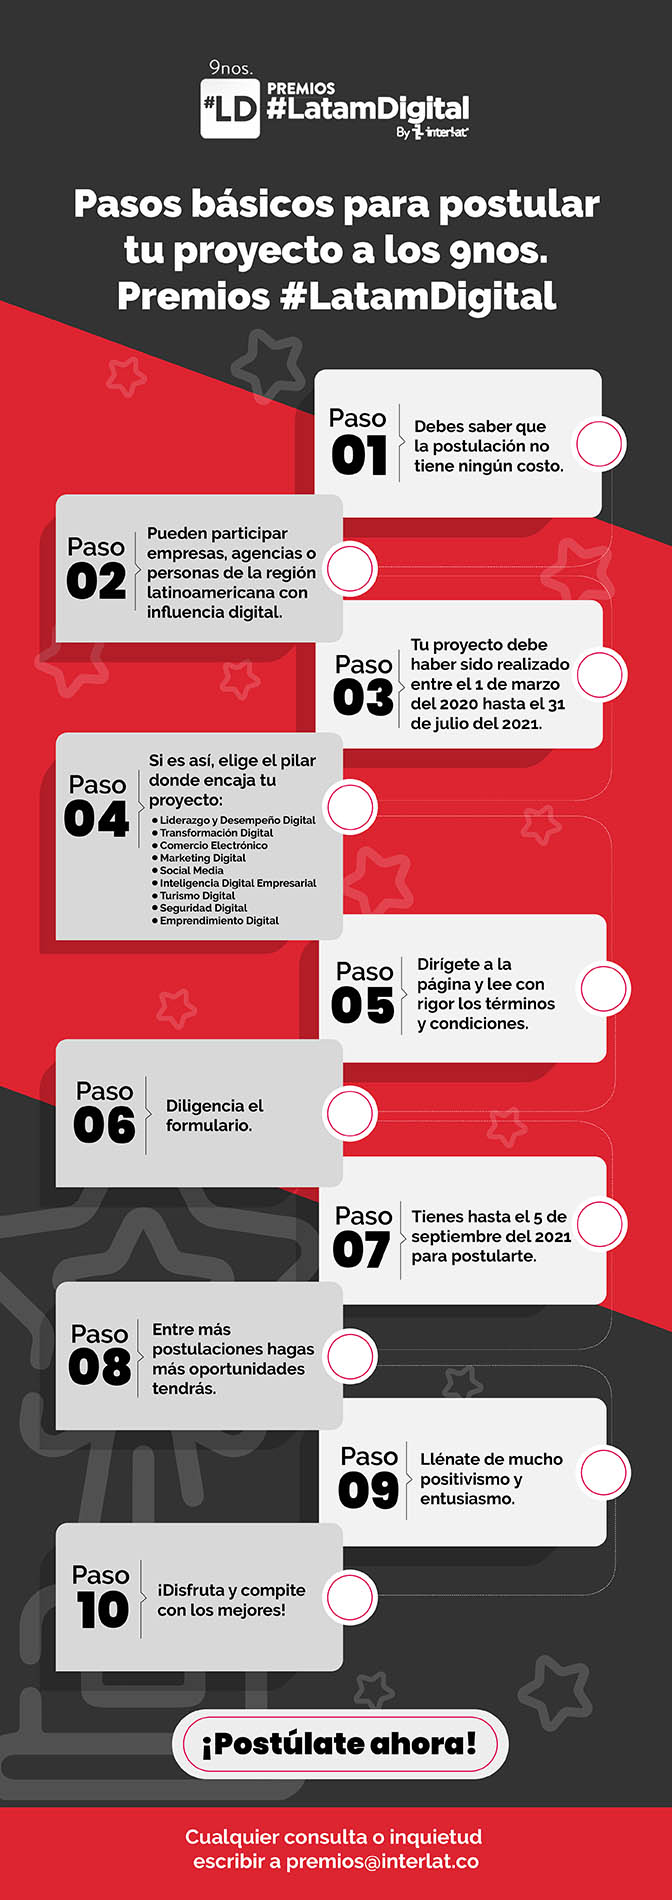 9nos. Premios #LatamDigital